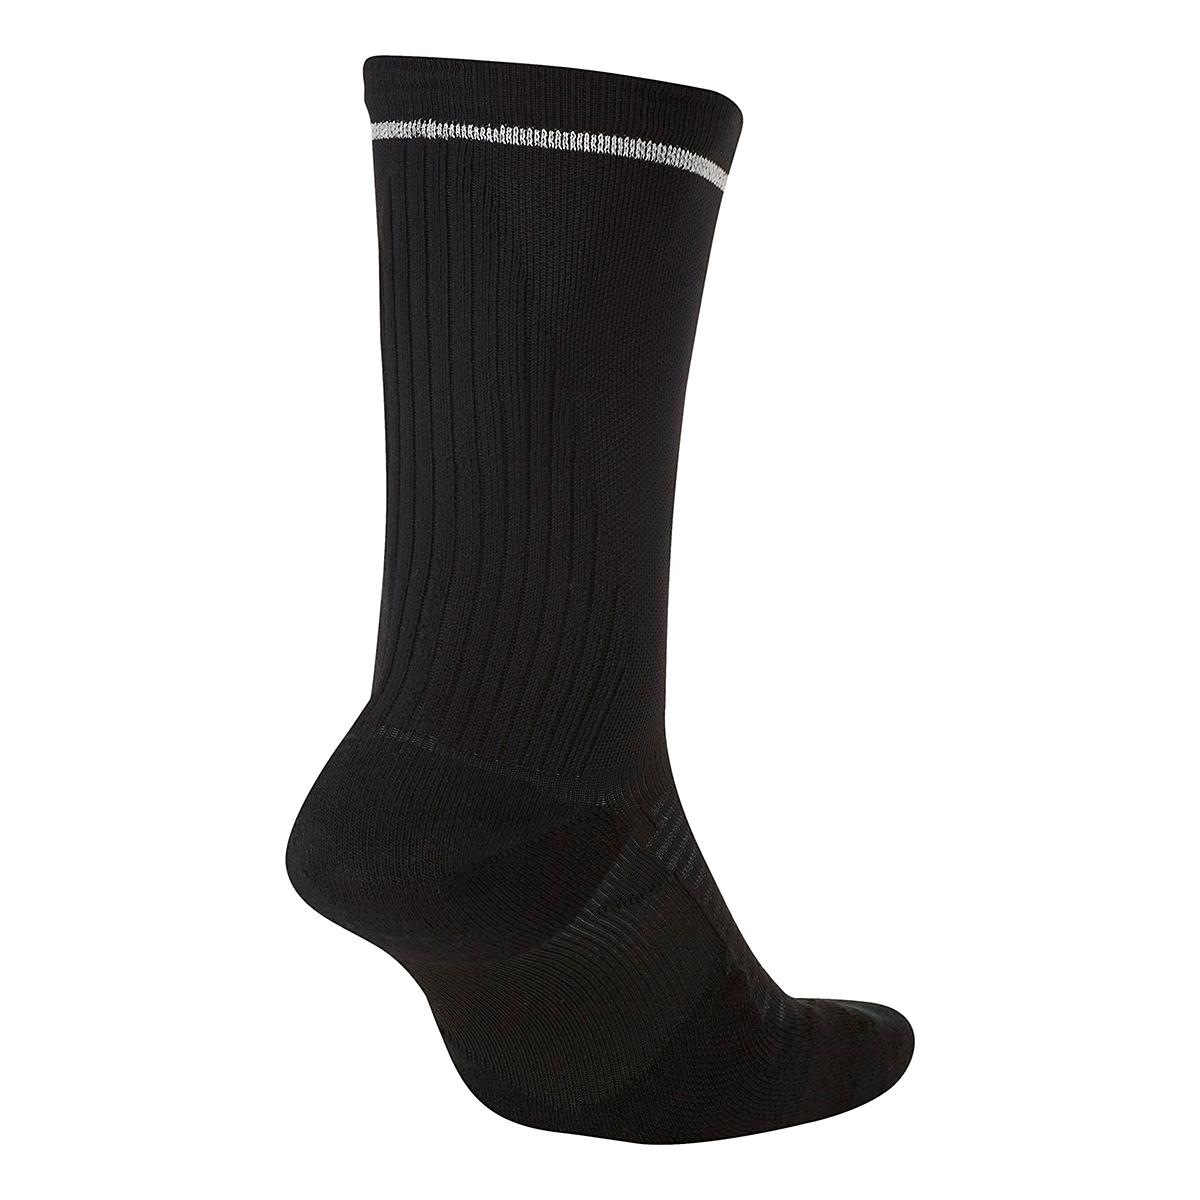 Nike Spark Cushion Crew Sock - Color: Black - Size: 4/5.5, Black, large, image 2